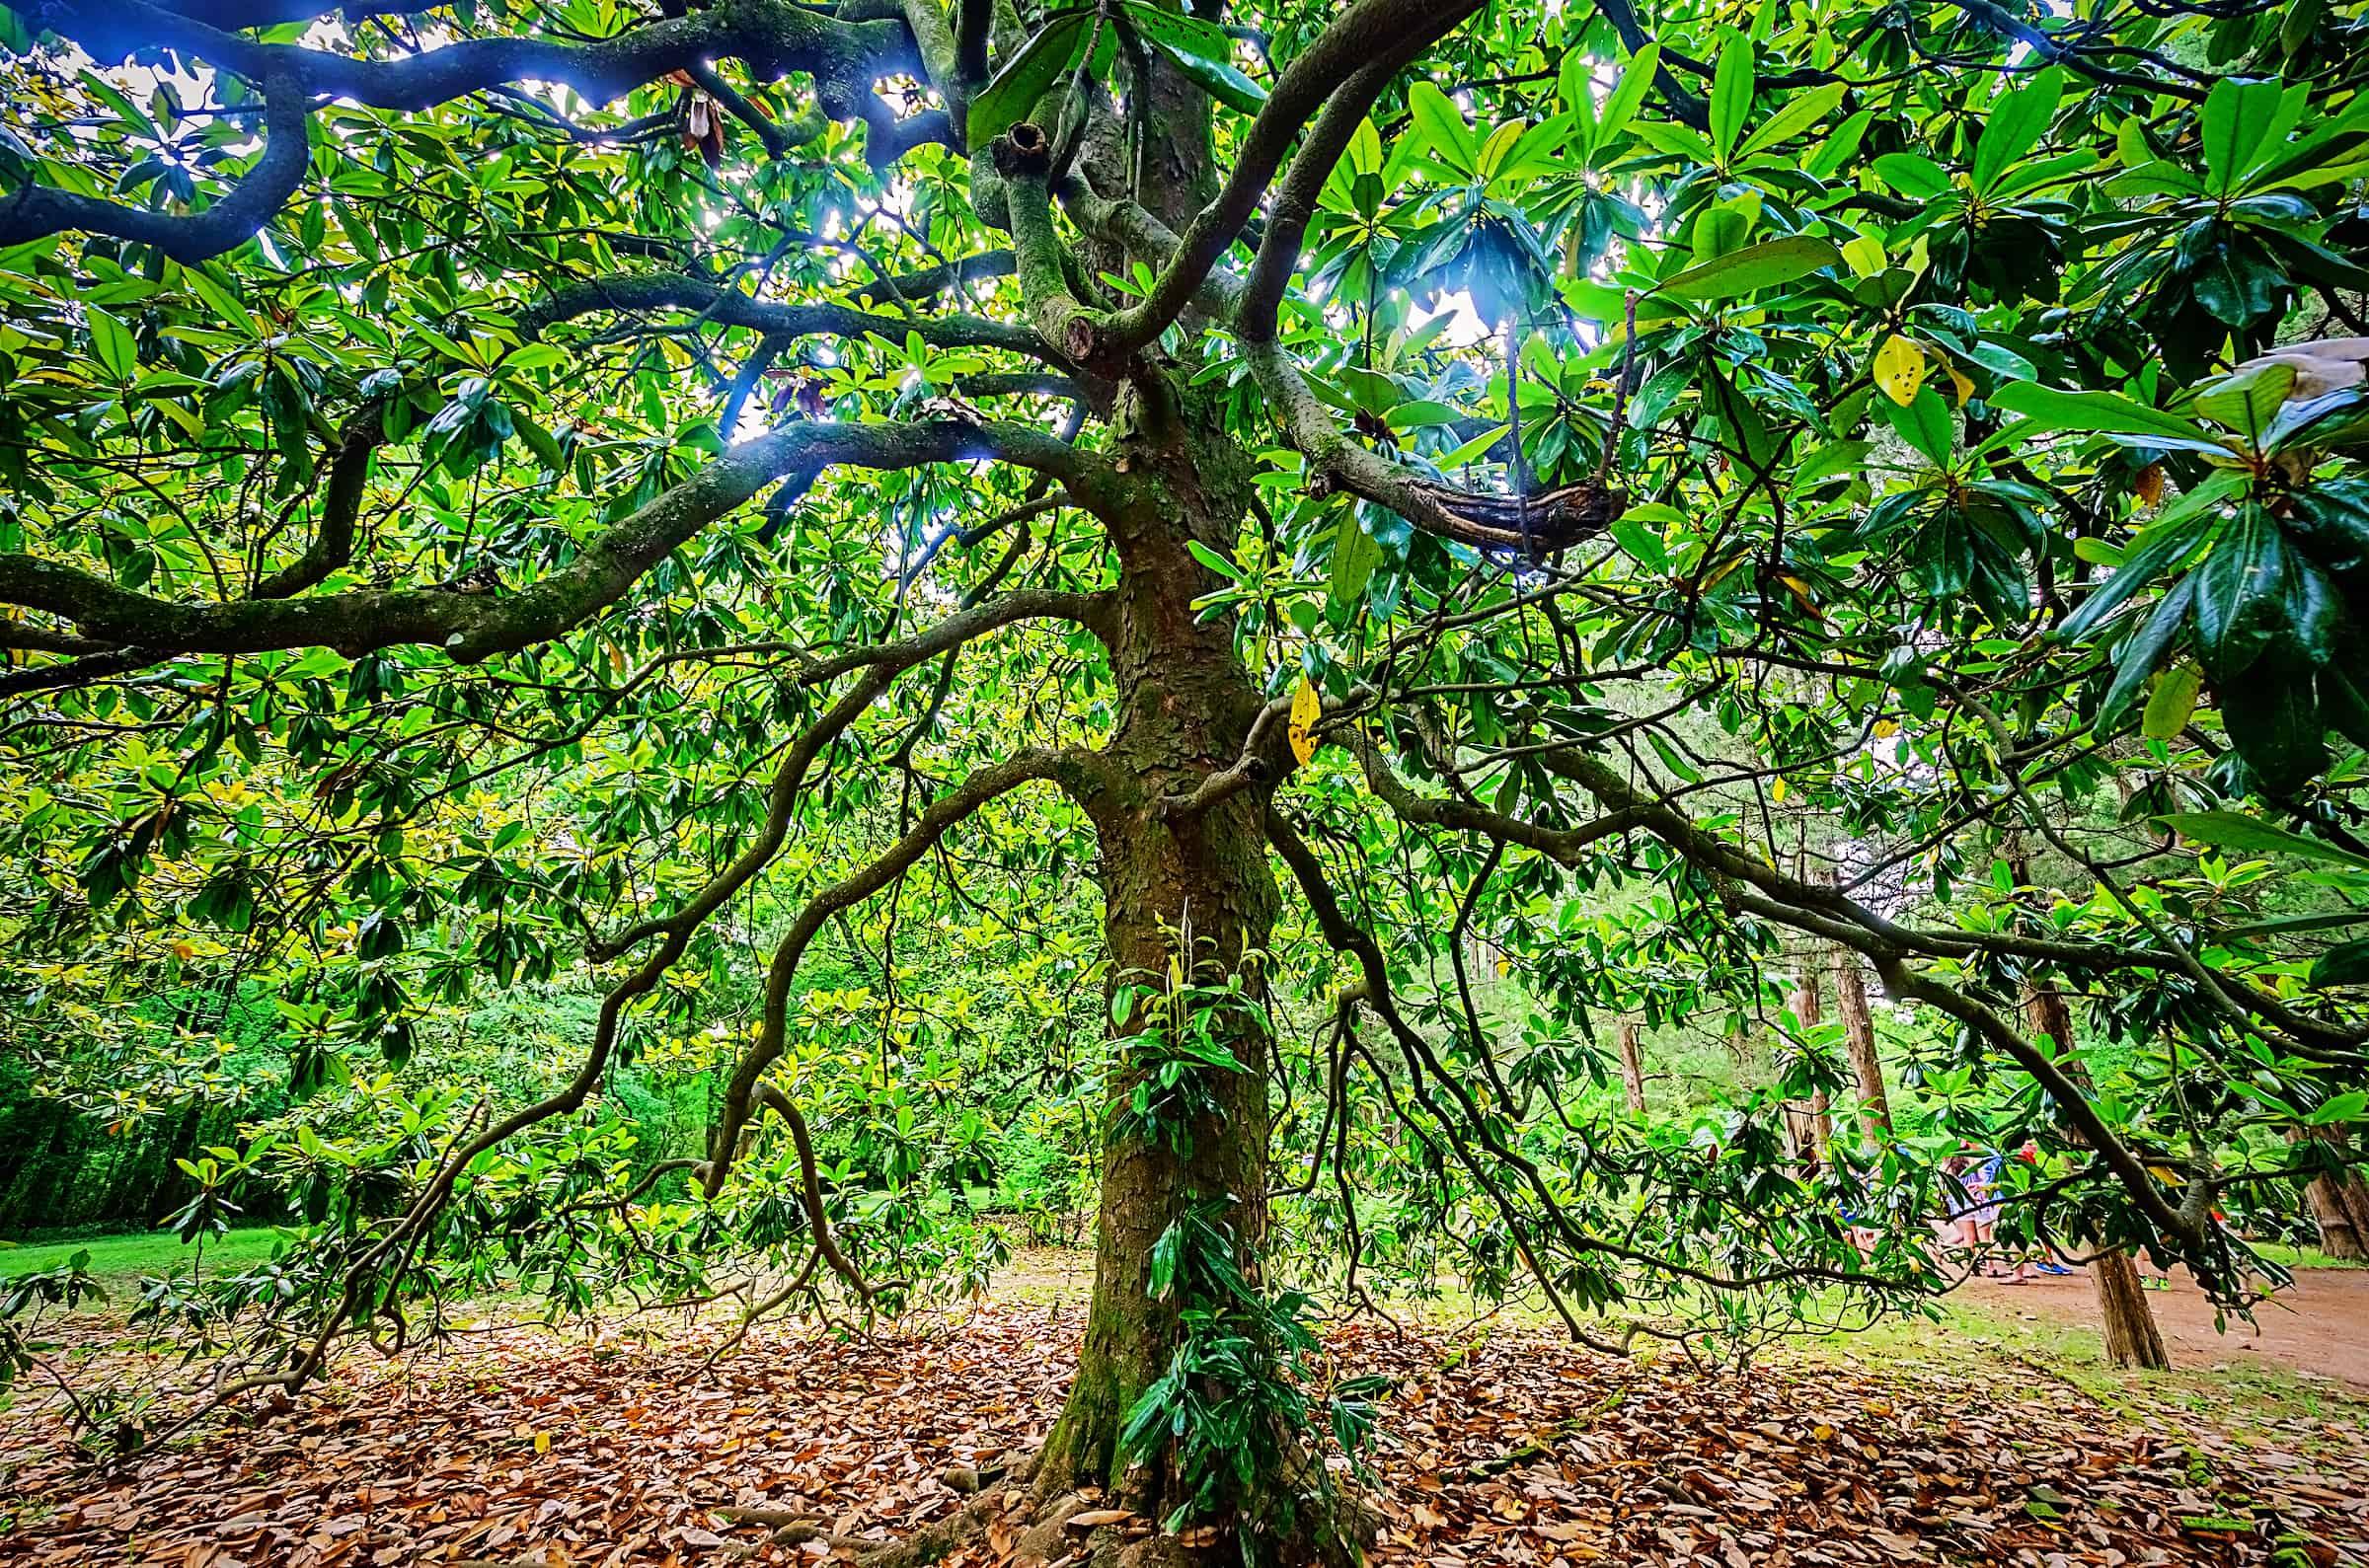 Sunlit magnolia tree at William Faulkner home Rowan Oak in Oxford Mississippi